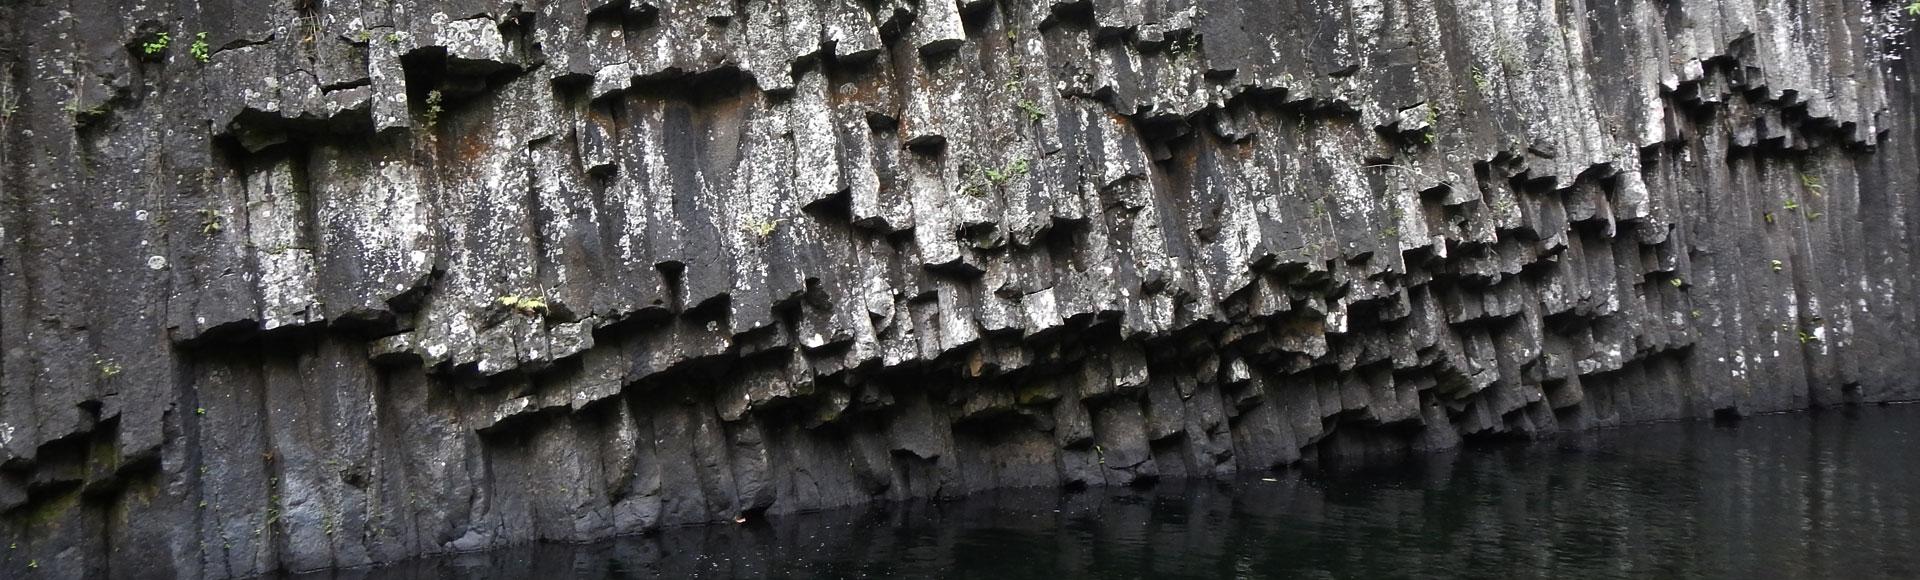 - Géologie et Hydrogéologie -